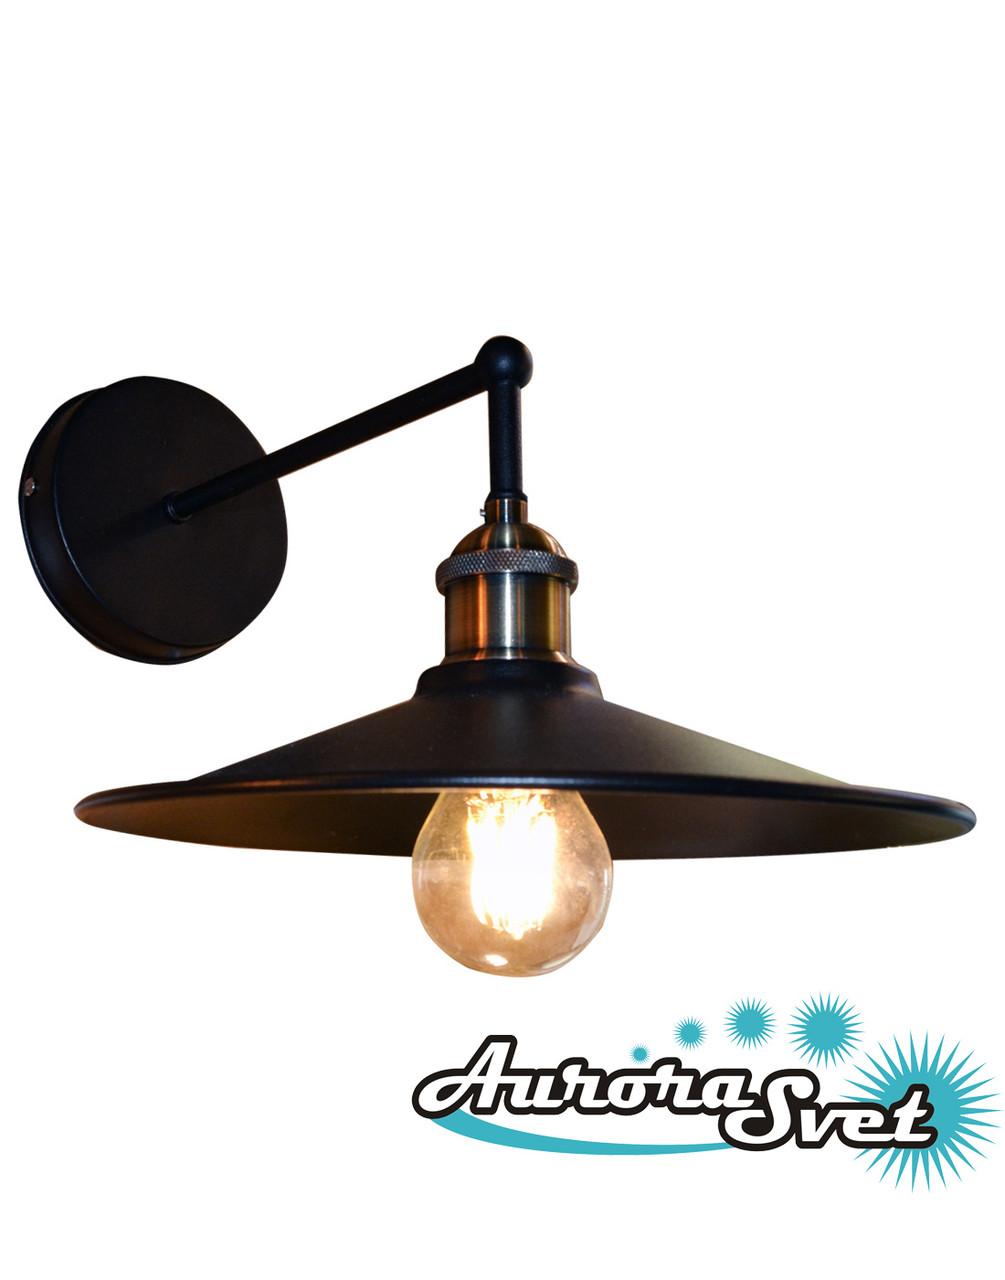 Бра настенная AuroraSvet loft 9100 чёрная. LED светильник бра. Светодиодный светильник бра.